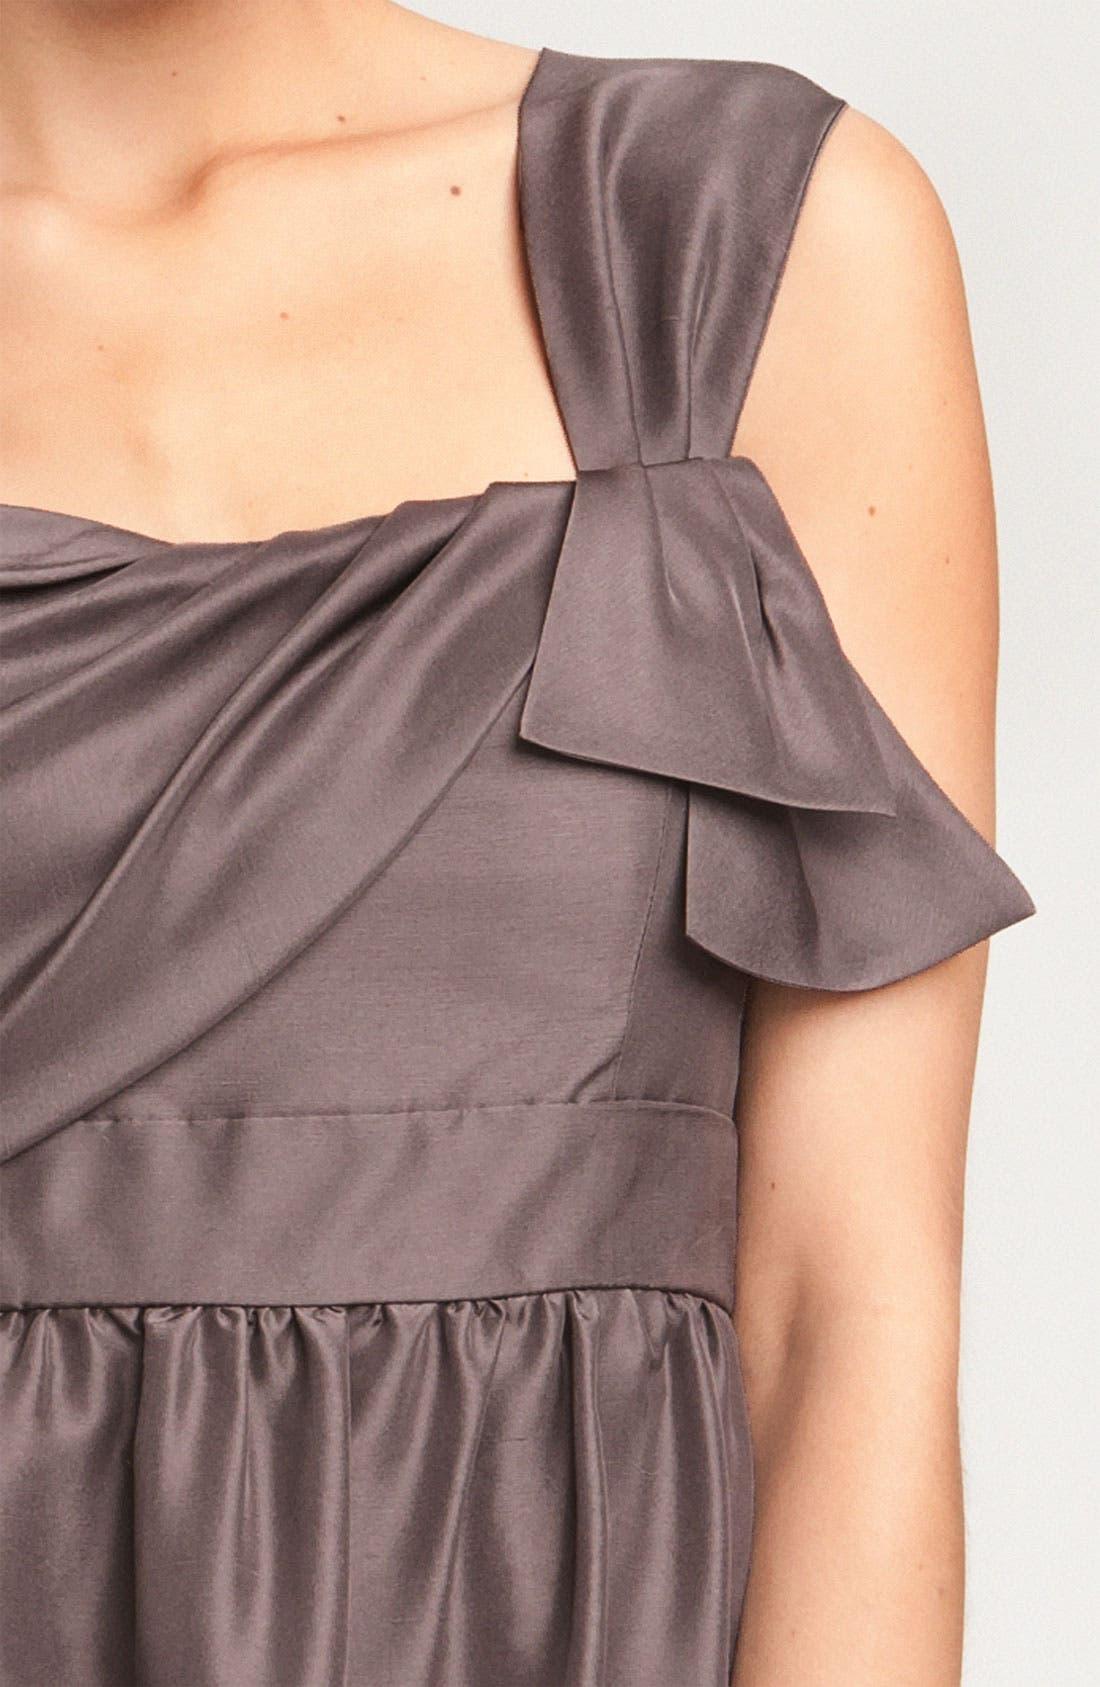 JENNY YOO, Convertible Shantung Dress, Alternate thumbnail 2, color, 020